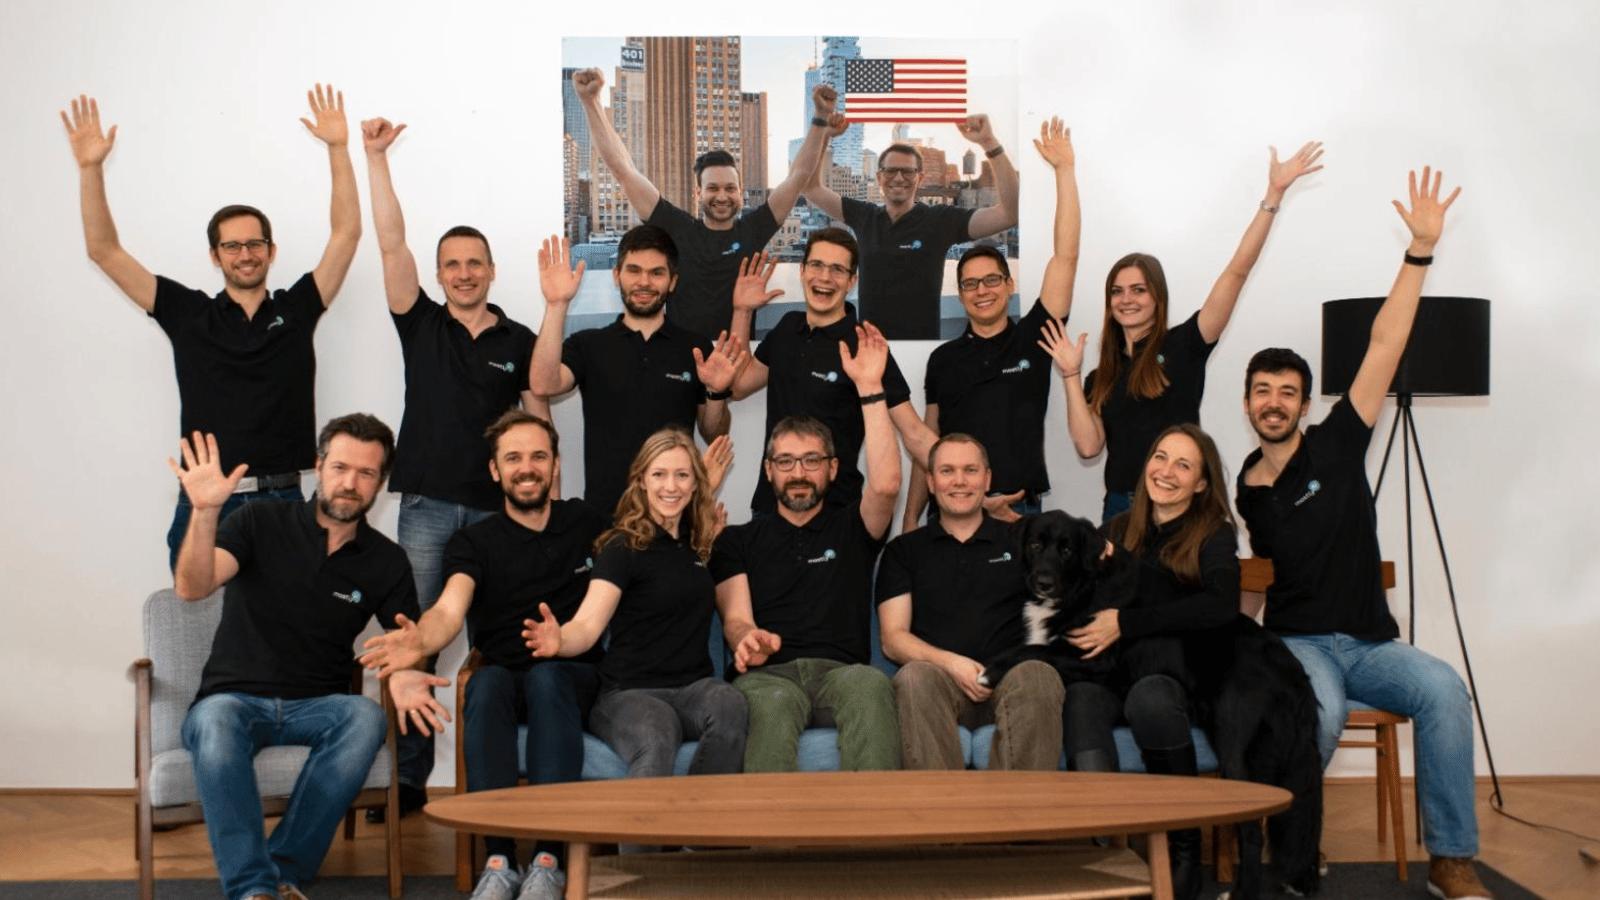 25 Startups Hiring For Junior Software Engineer Jobs Angellist